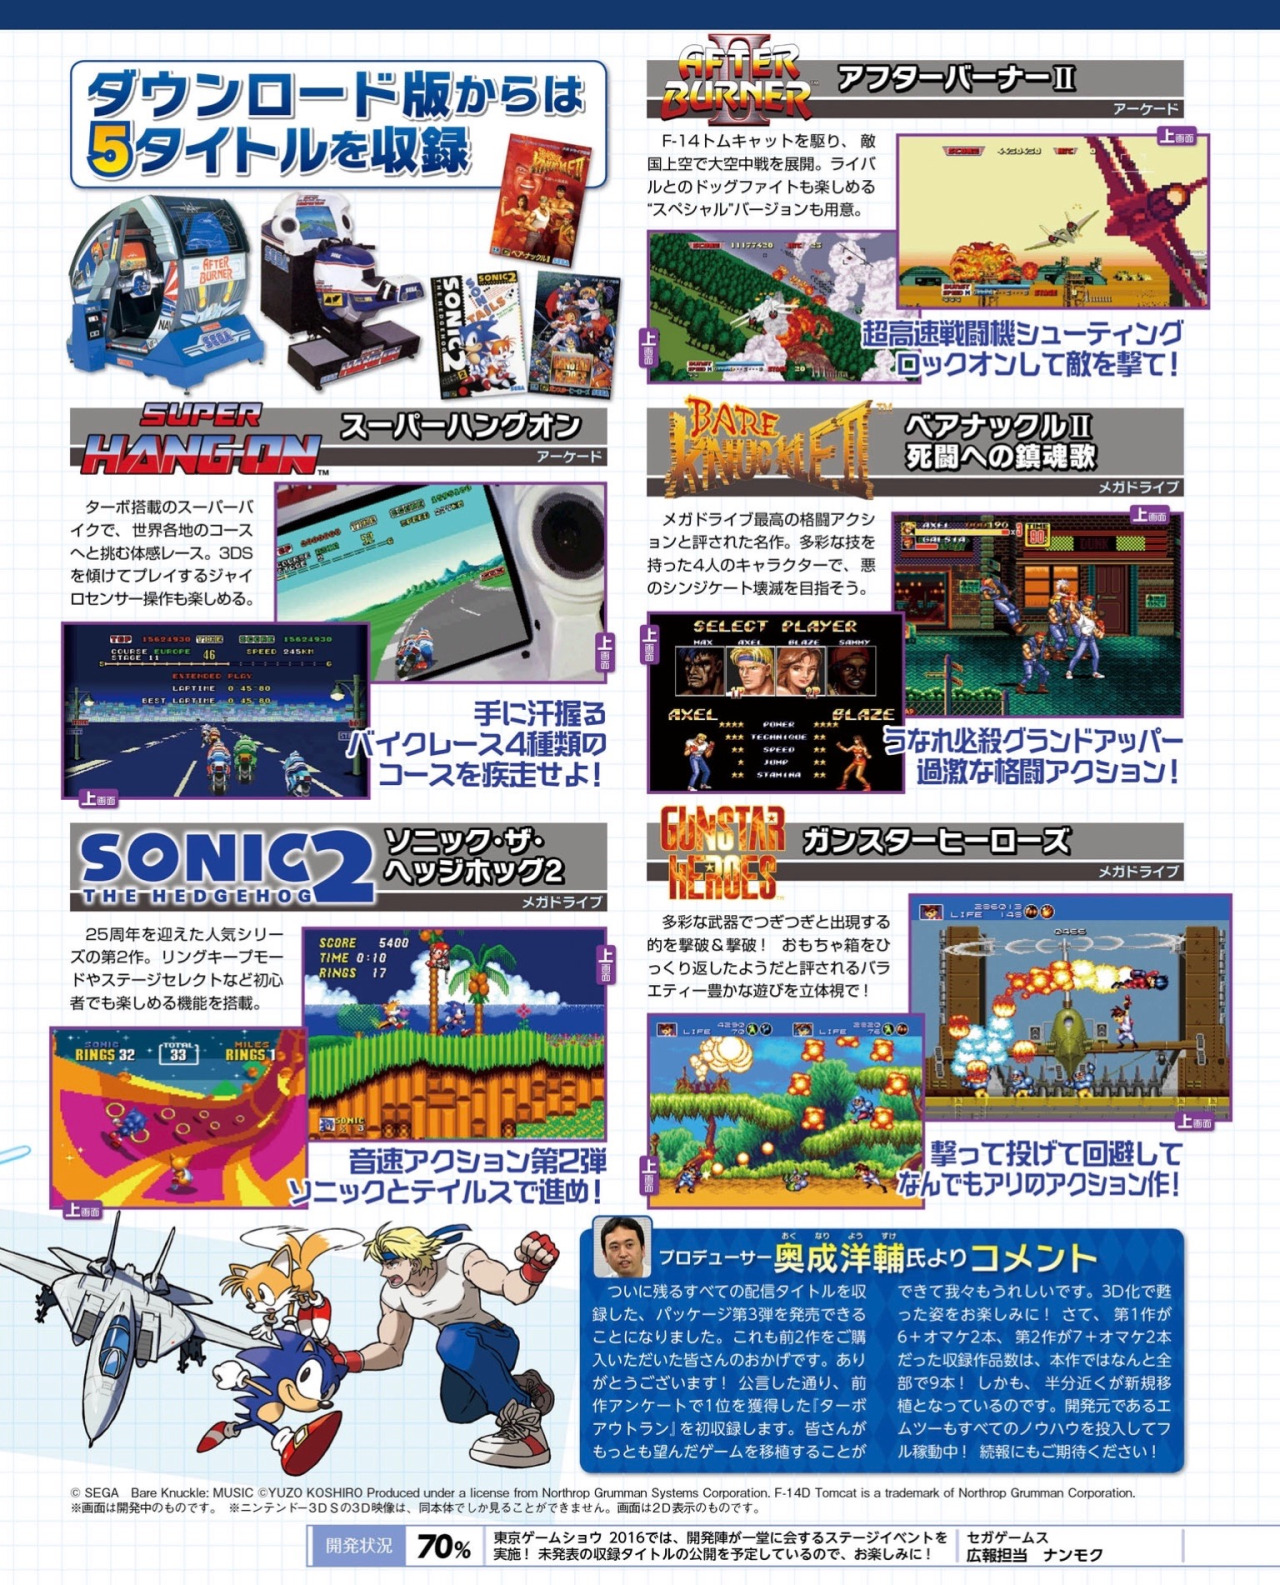 Sega 3D Fukkoku Archives 3: FINAL STAGE (Currently JP-only) - Video